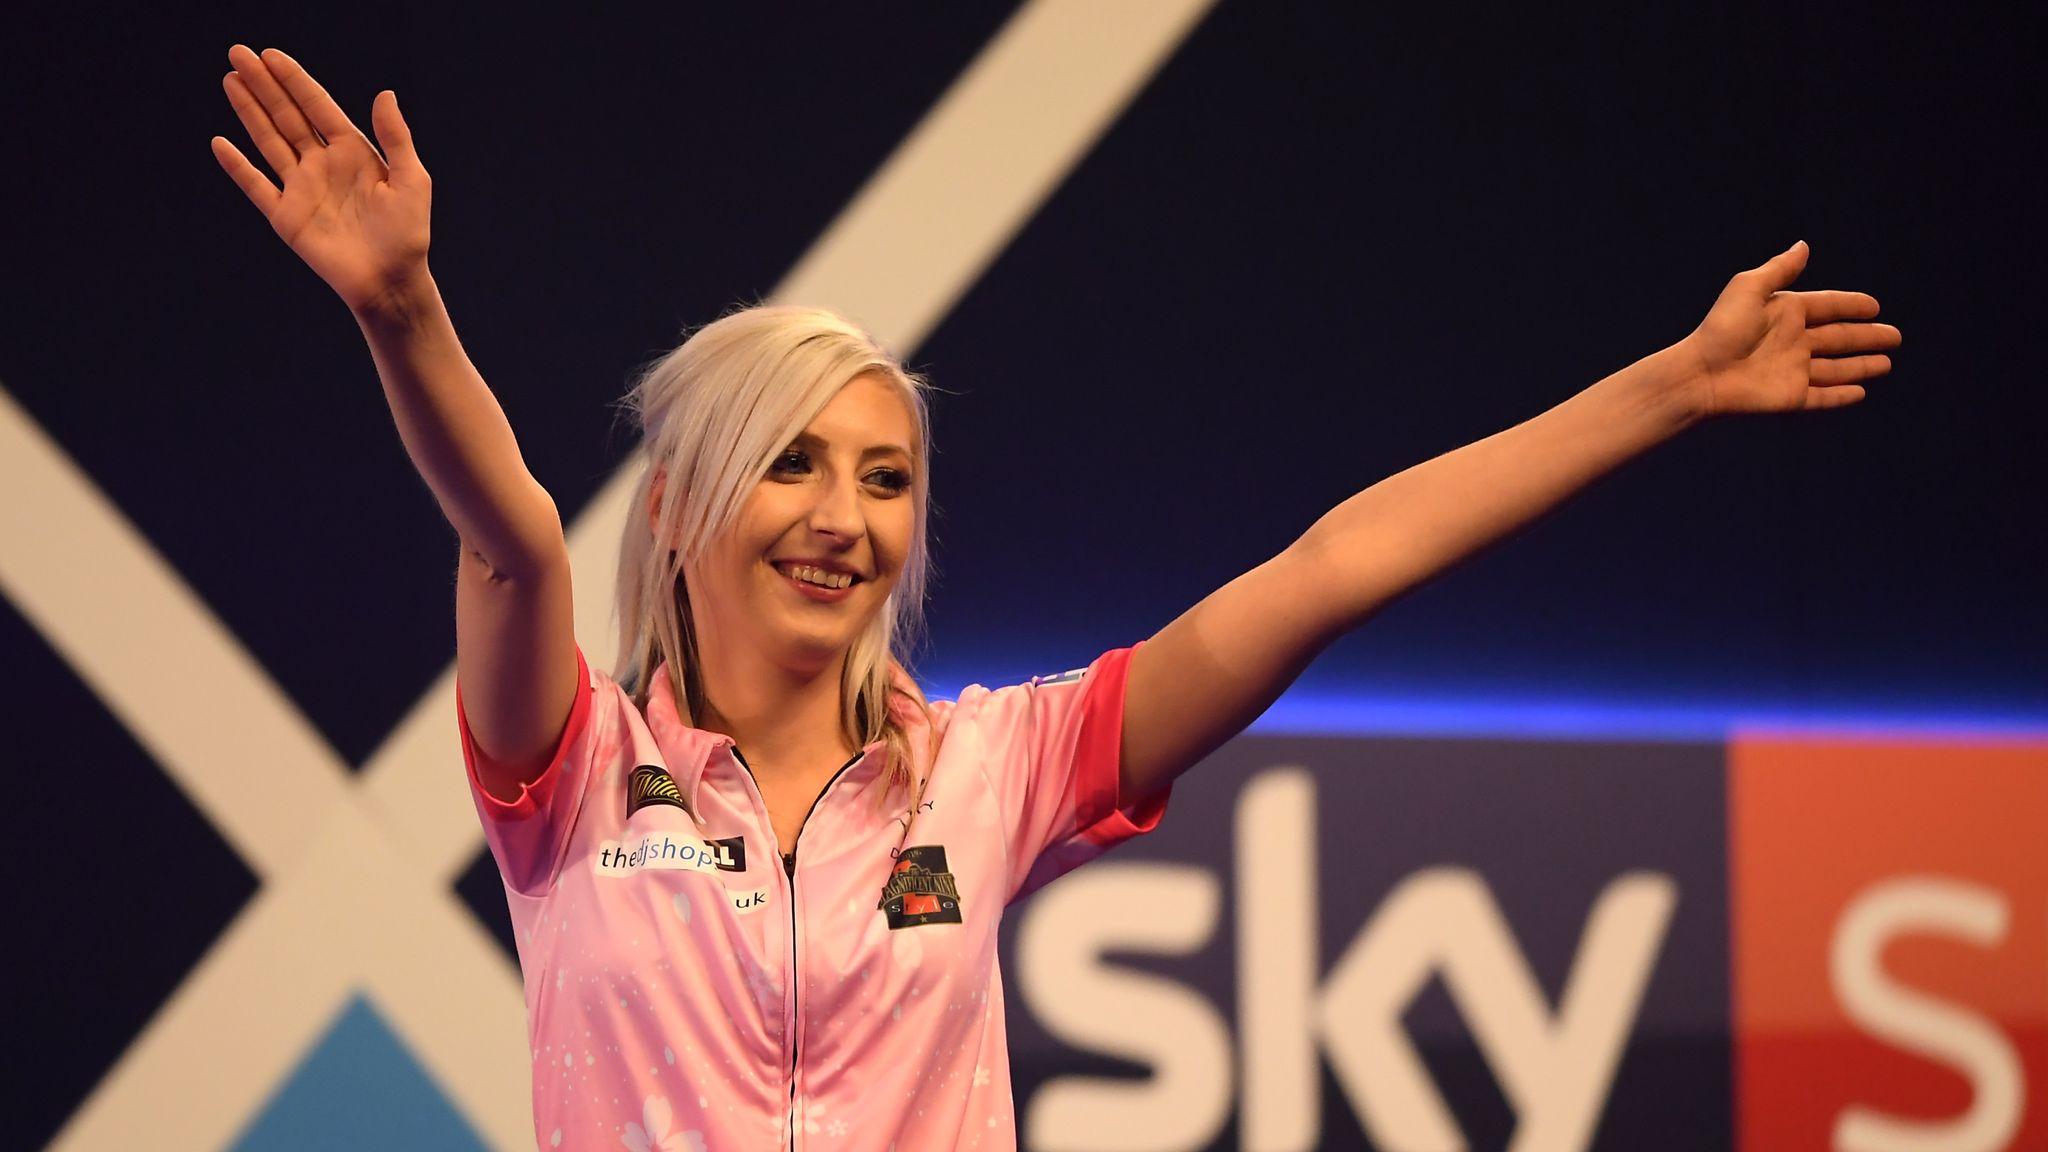 Female darts player Fallon Sherrock beats another man at World Championships